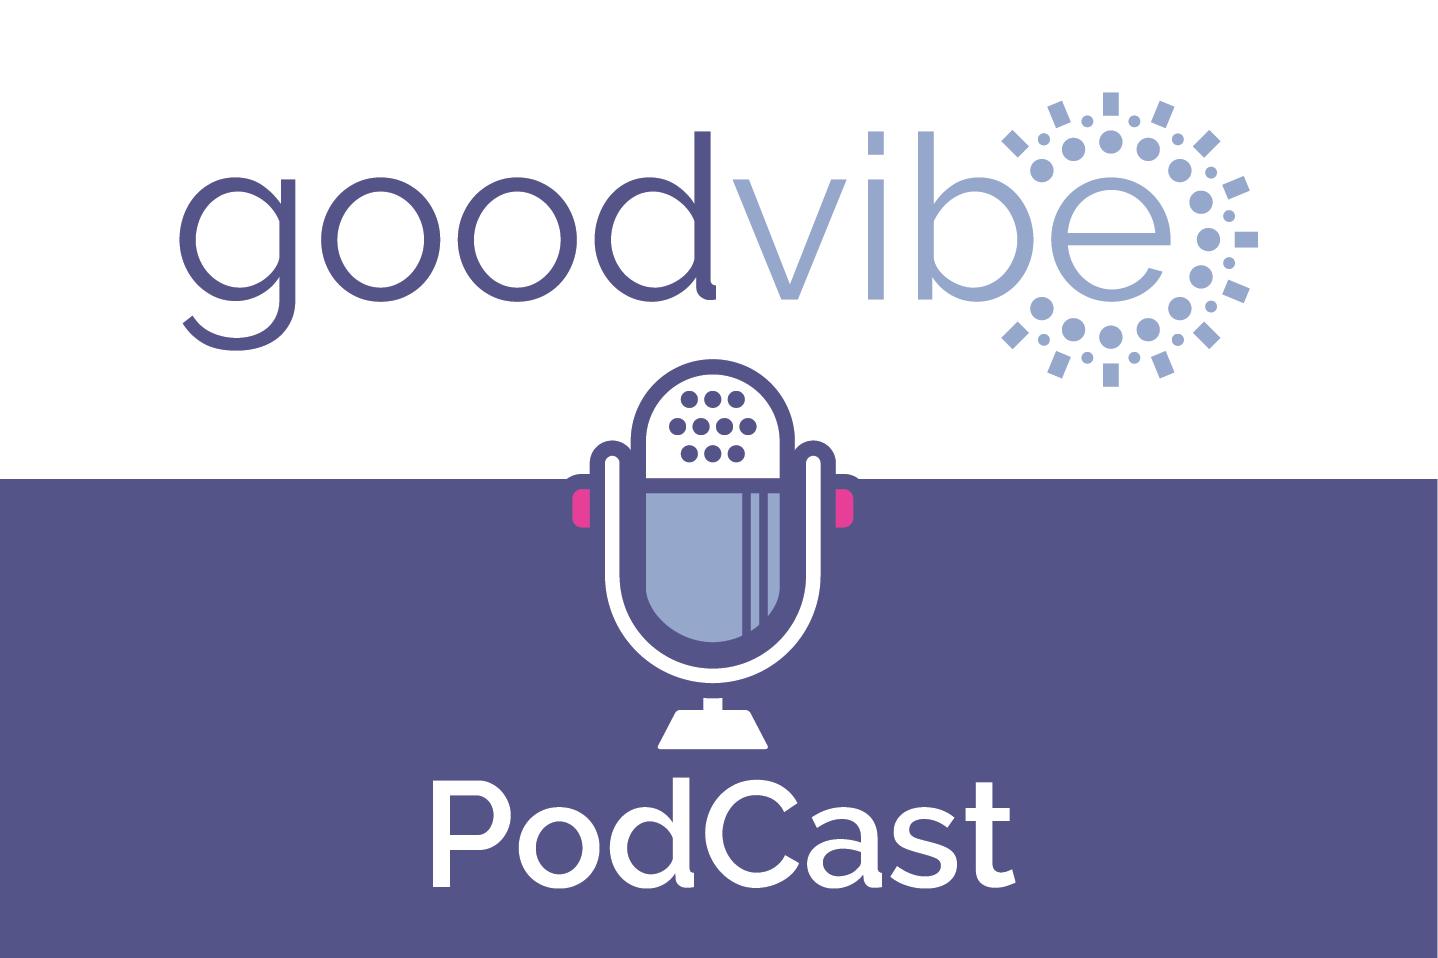 goodvibe podcast